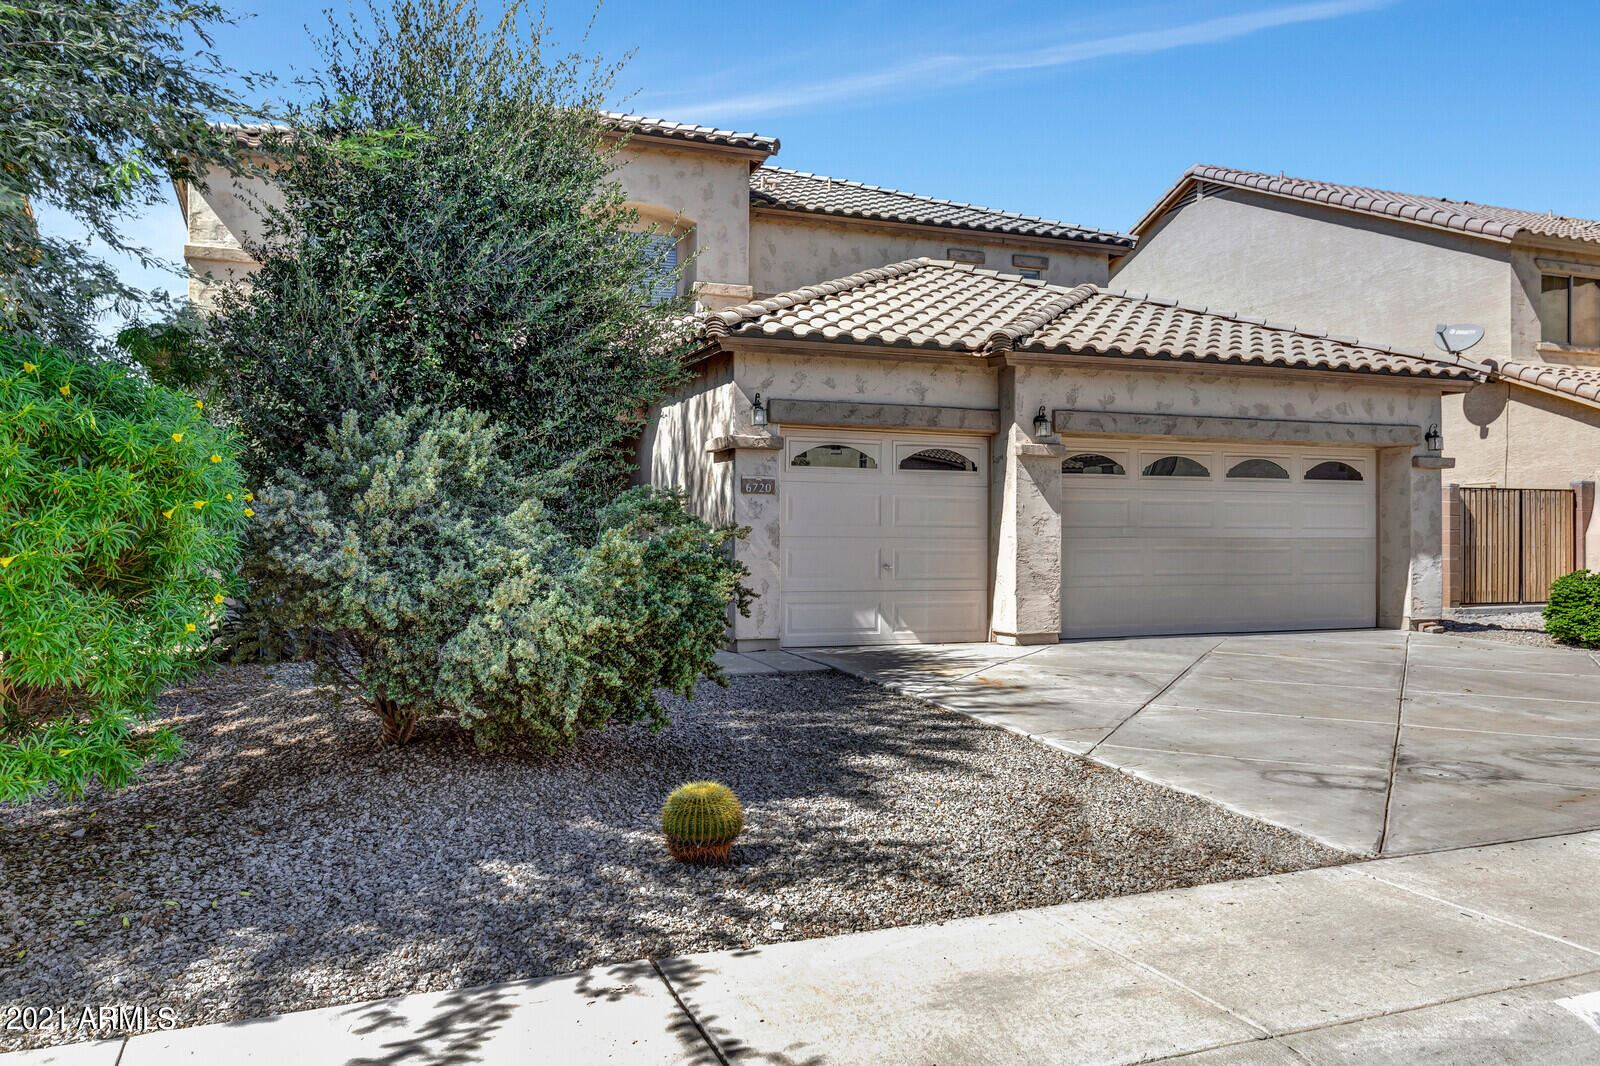 Photo of 6720 S 54TH Lane, Laveen, AZ 85339 (MLS # 6304785)